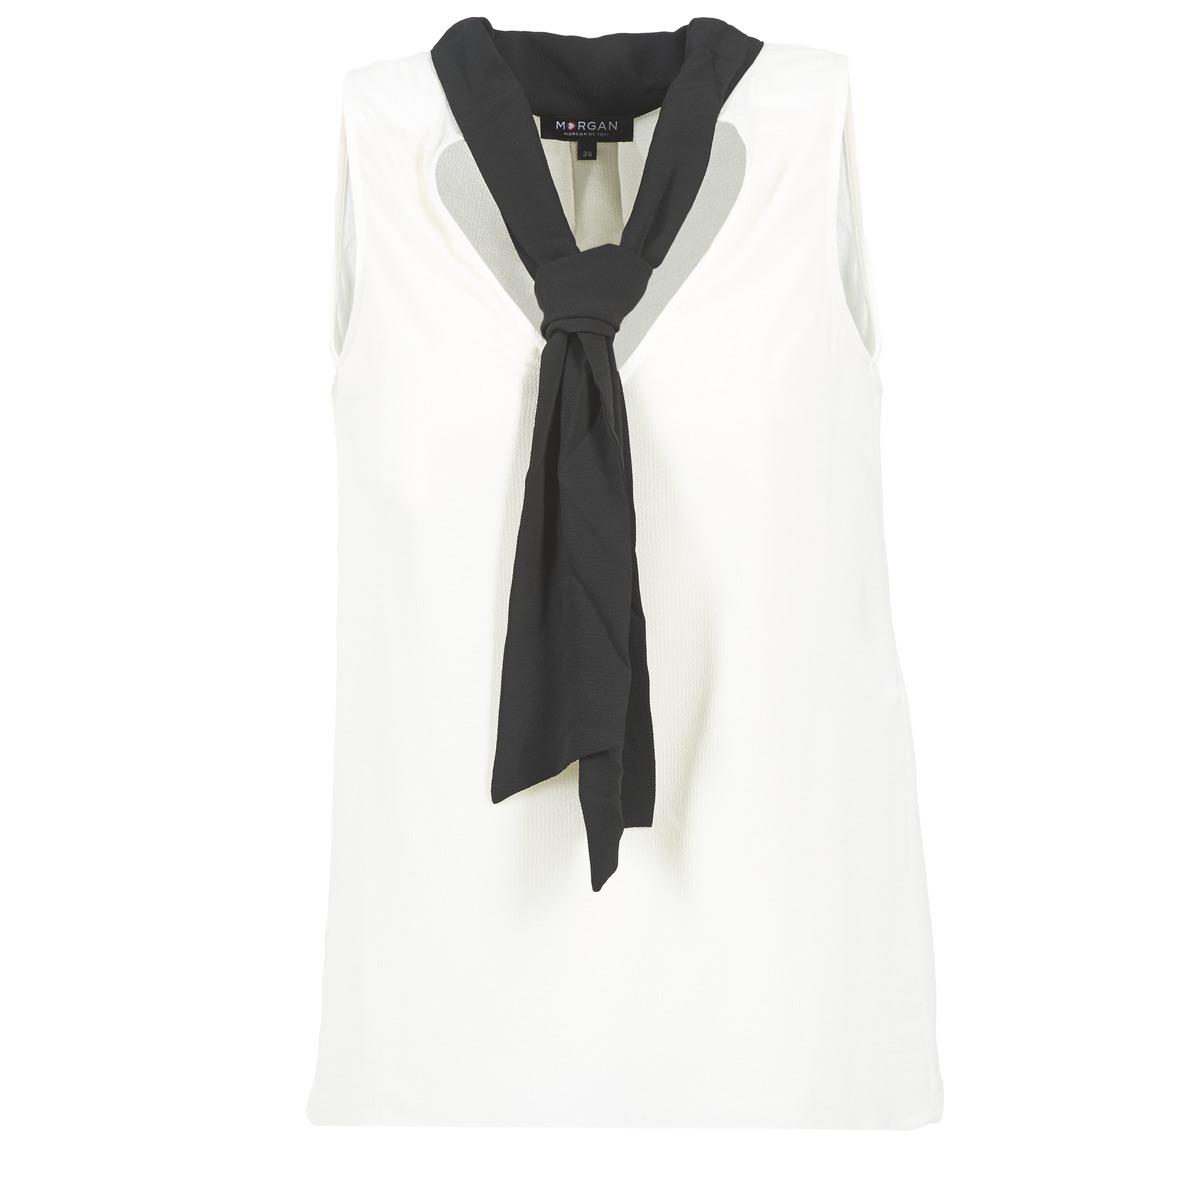 Blouses Morgan OREA Blanc / Noir